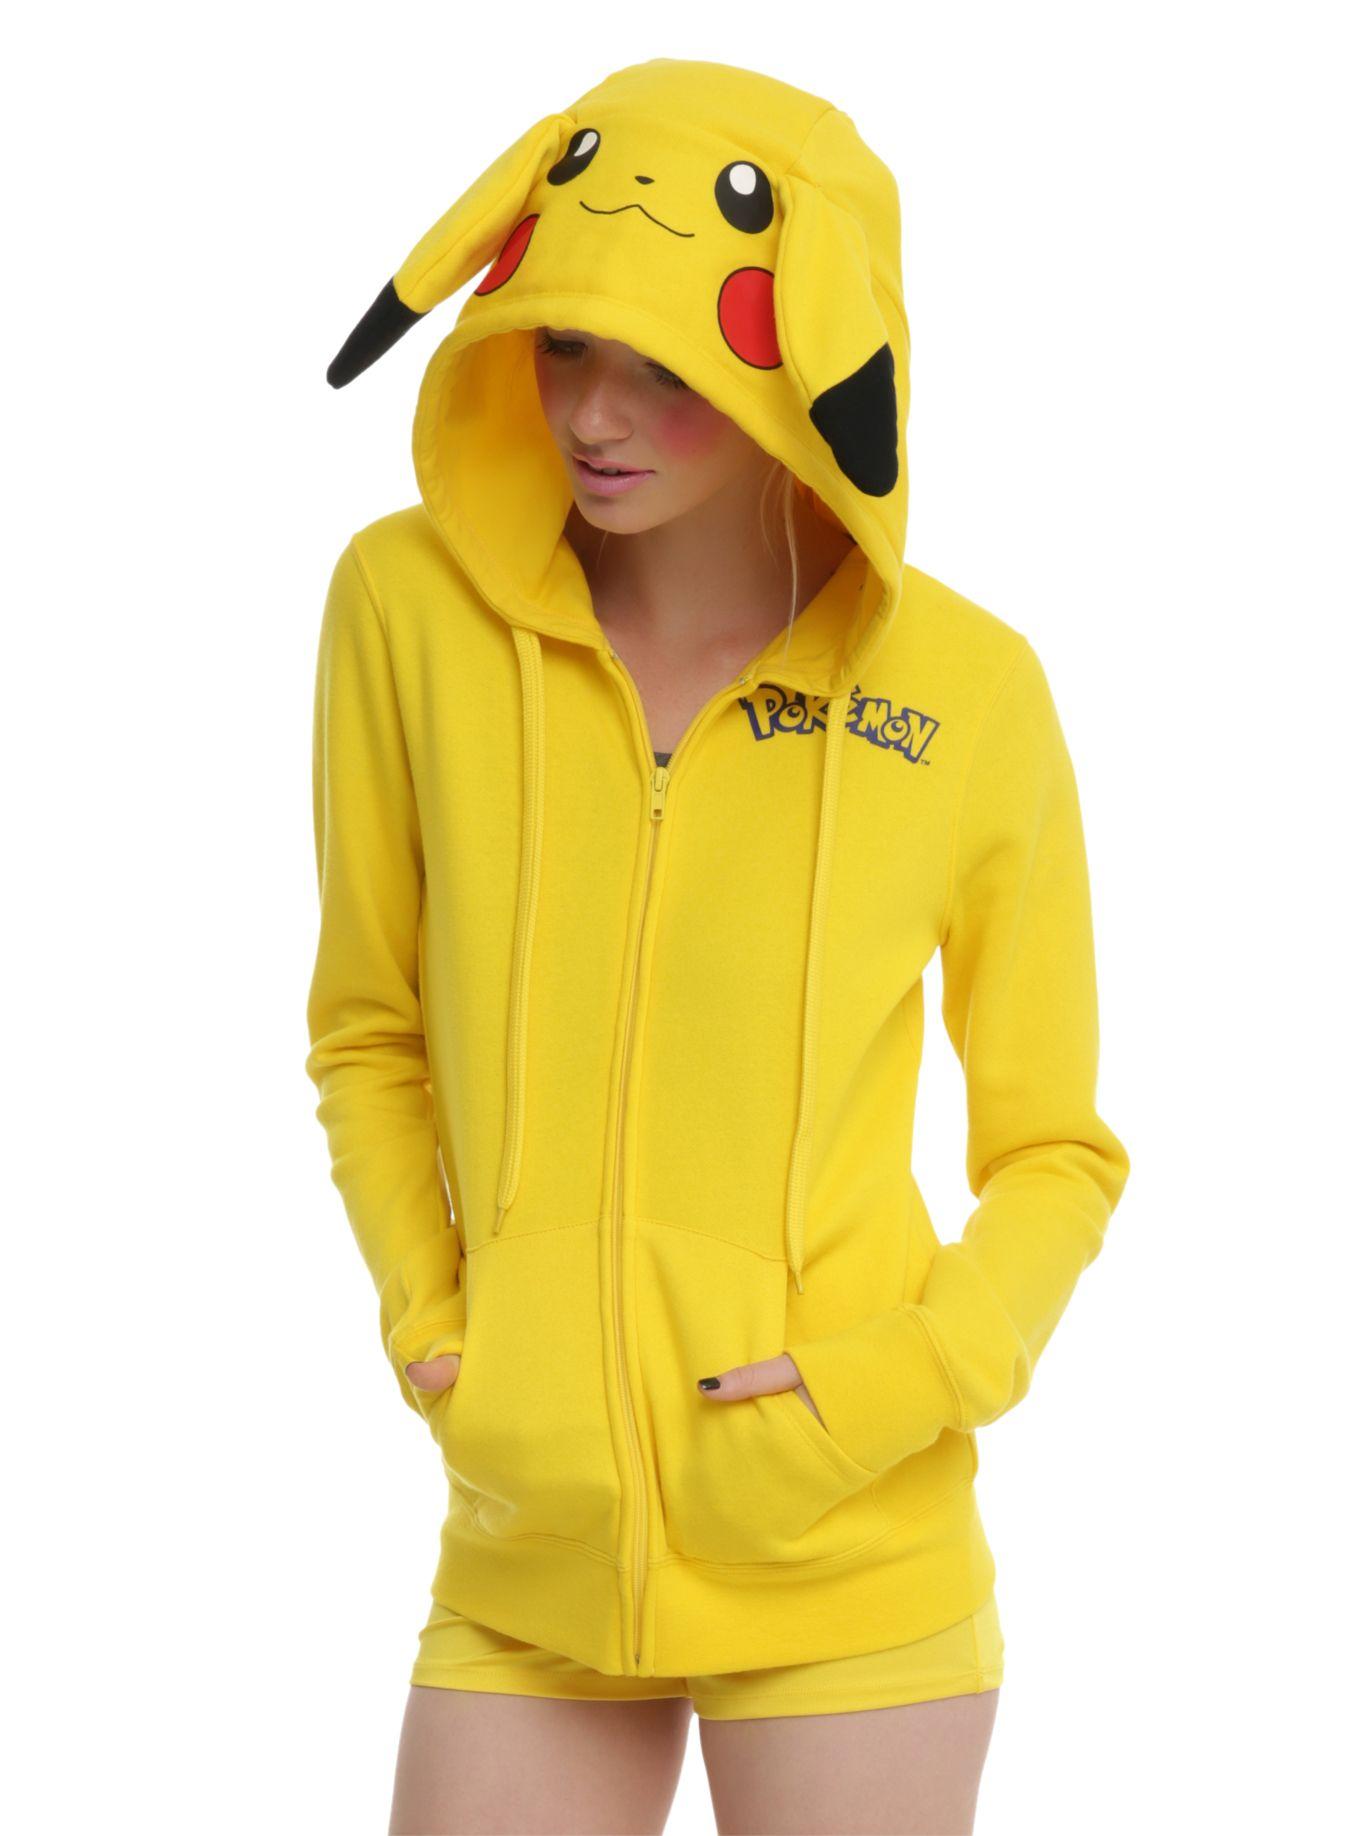 Check this outpokemon pikachu costume girls hoodie